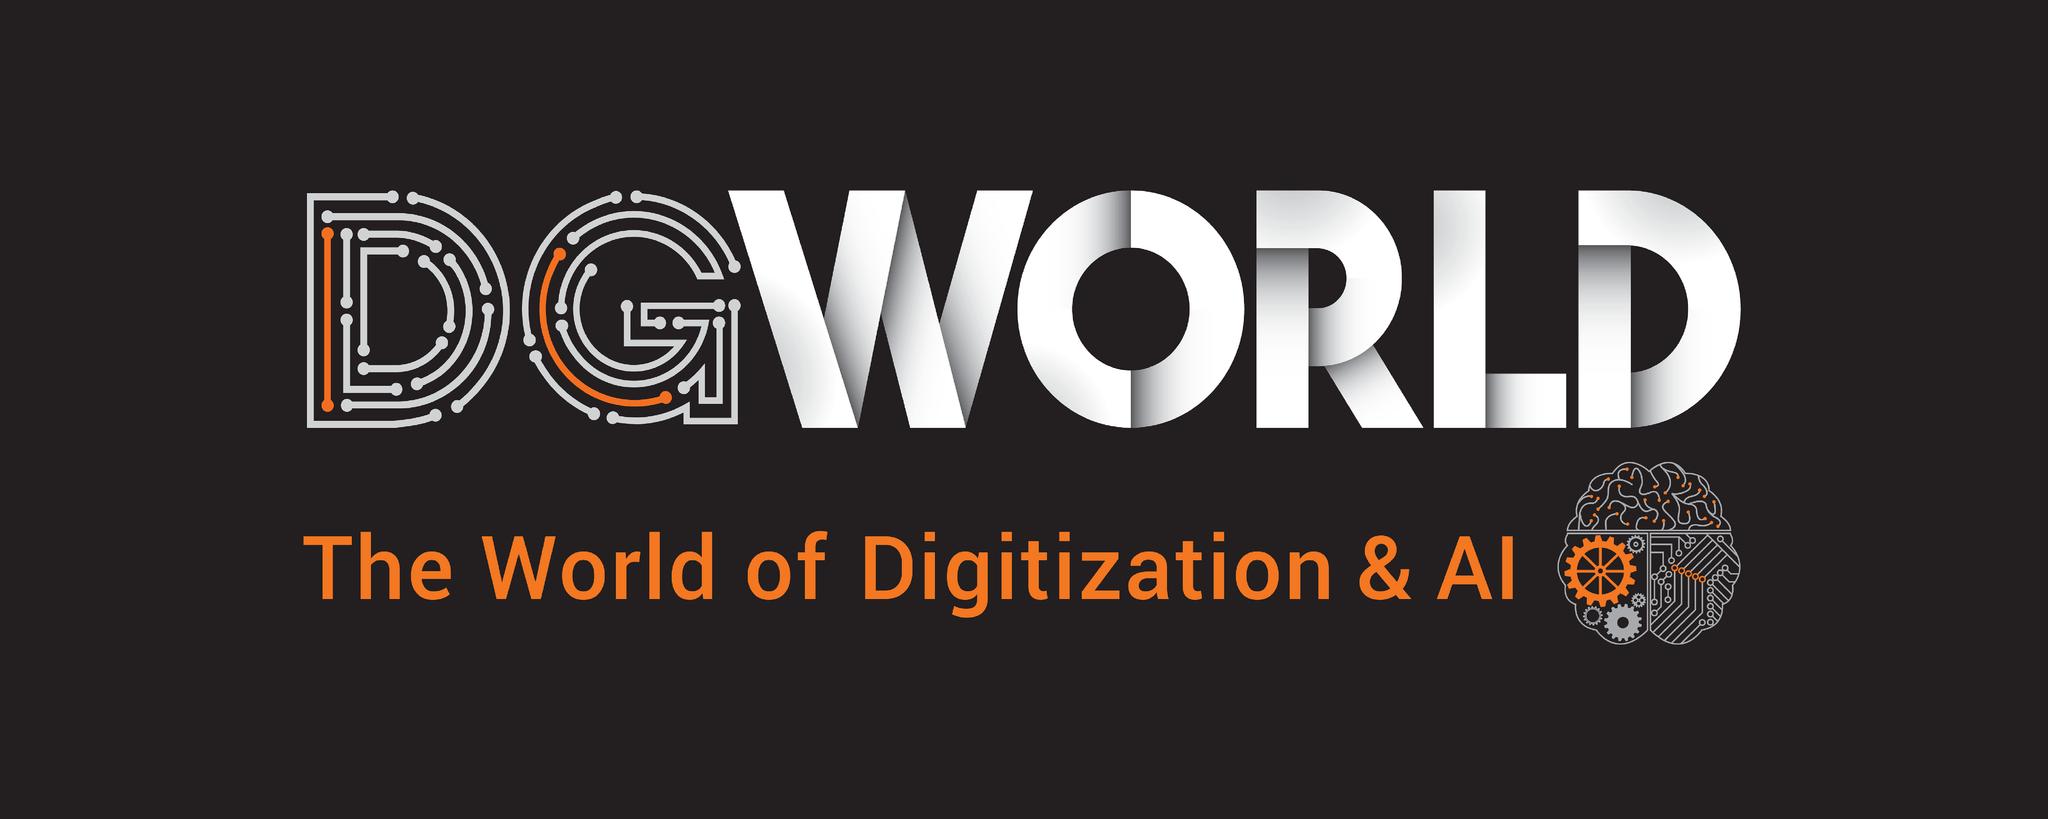 DG World